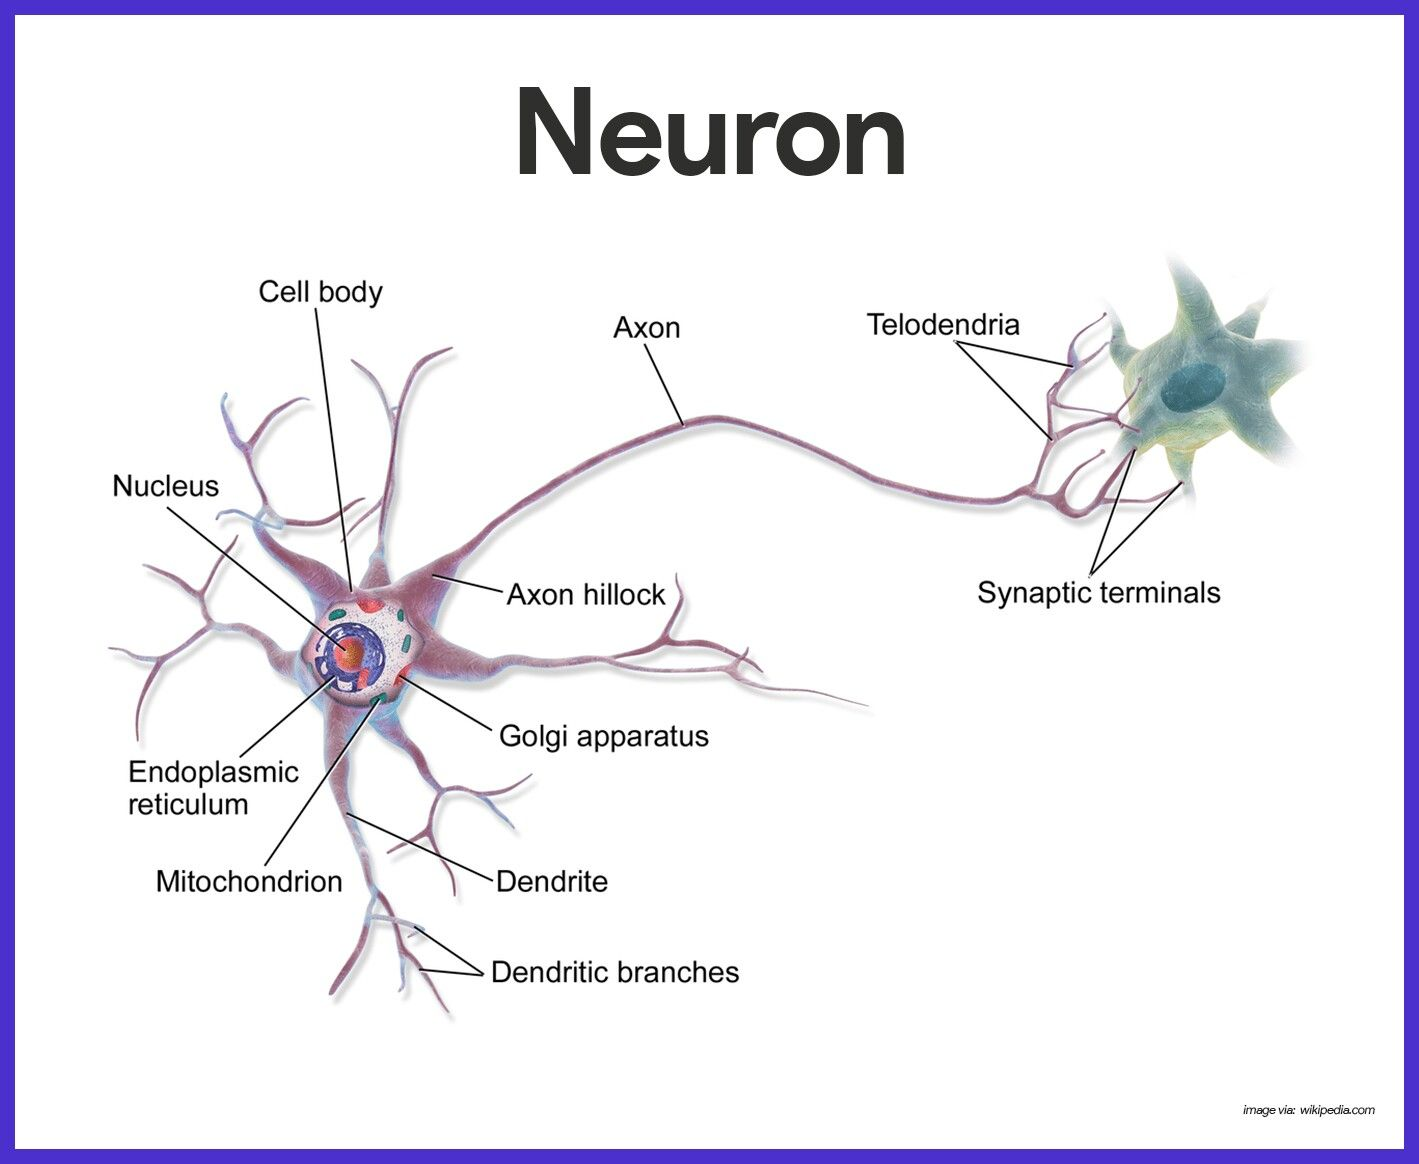 small resolution of blausen 0657 multipolarneuron multipolar neuron wikipedia the free encyclopedia neurons autonomic nervous system